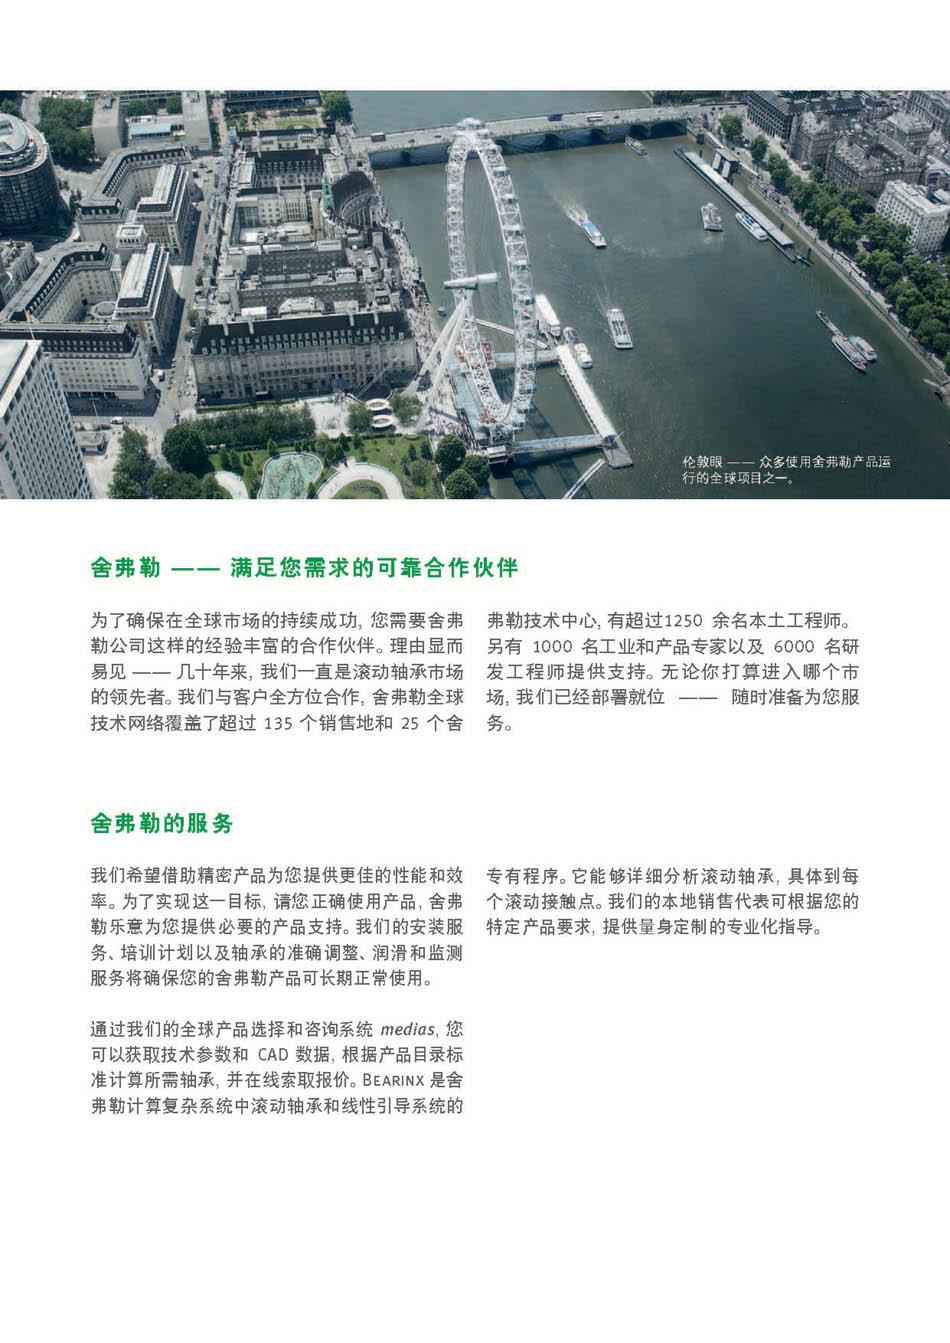 Brochure_GenerationC_CN_lowres4 (2)_页面_10.jpg